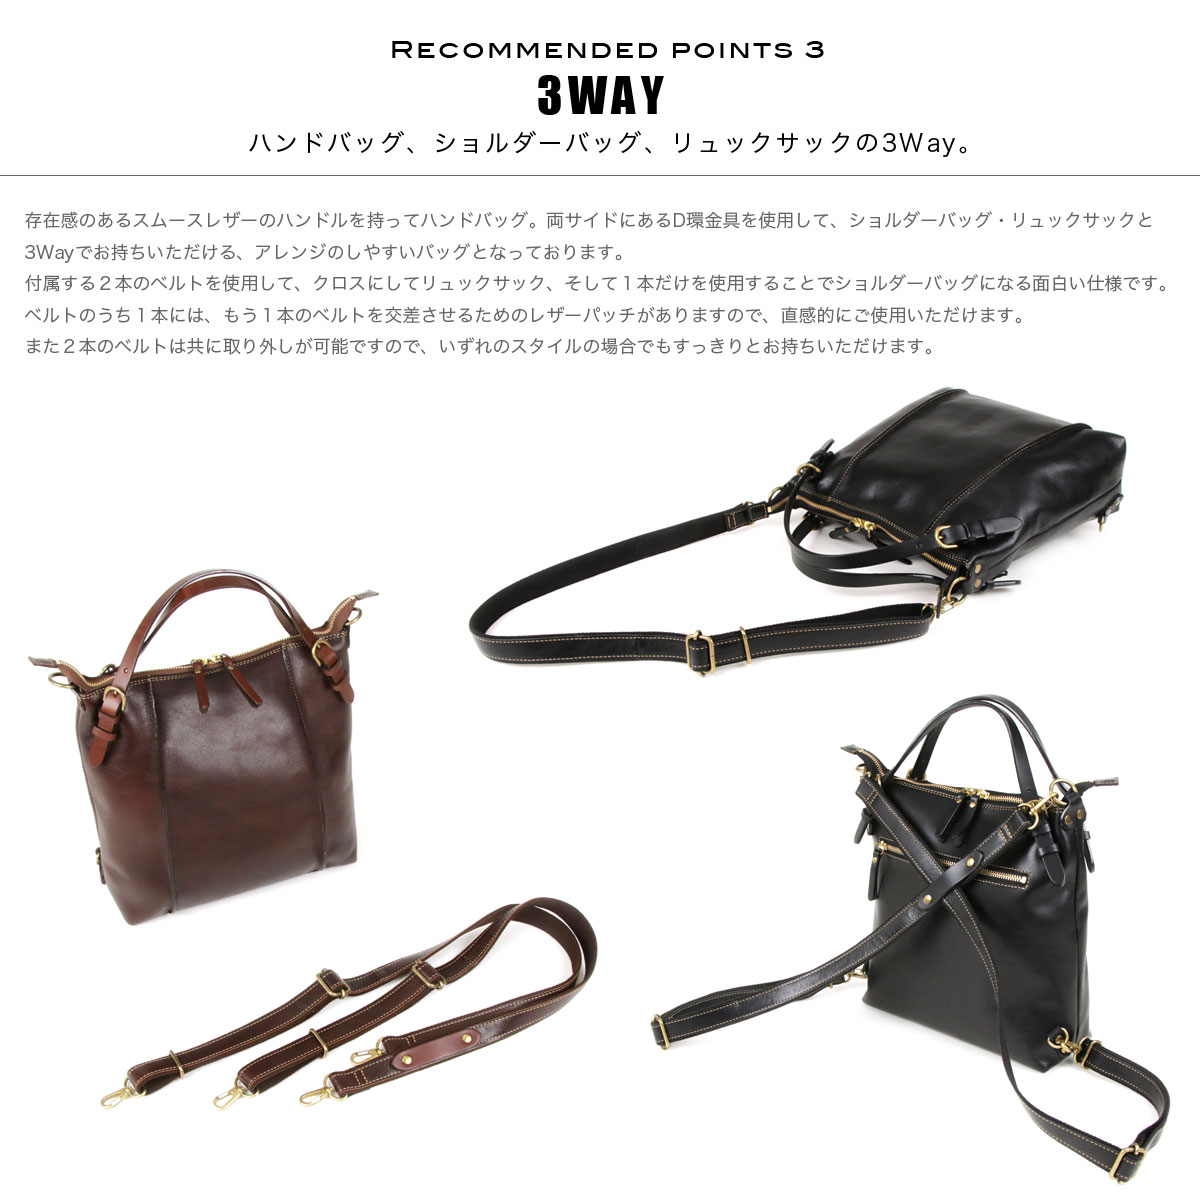 3Wayバッグ リュックサック ショルダーバッグ ハンドバッグ レディース スクエア型 姫路レザー 本革 innocent Sac イノセントサック 角底 日本製 国産 女性用 婦人用 バックパック